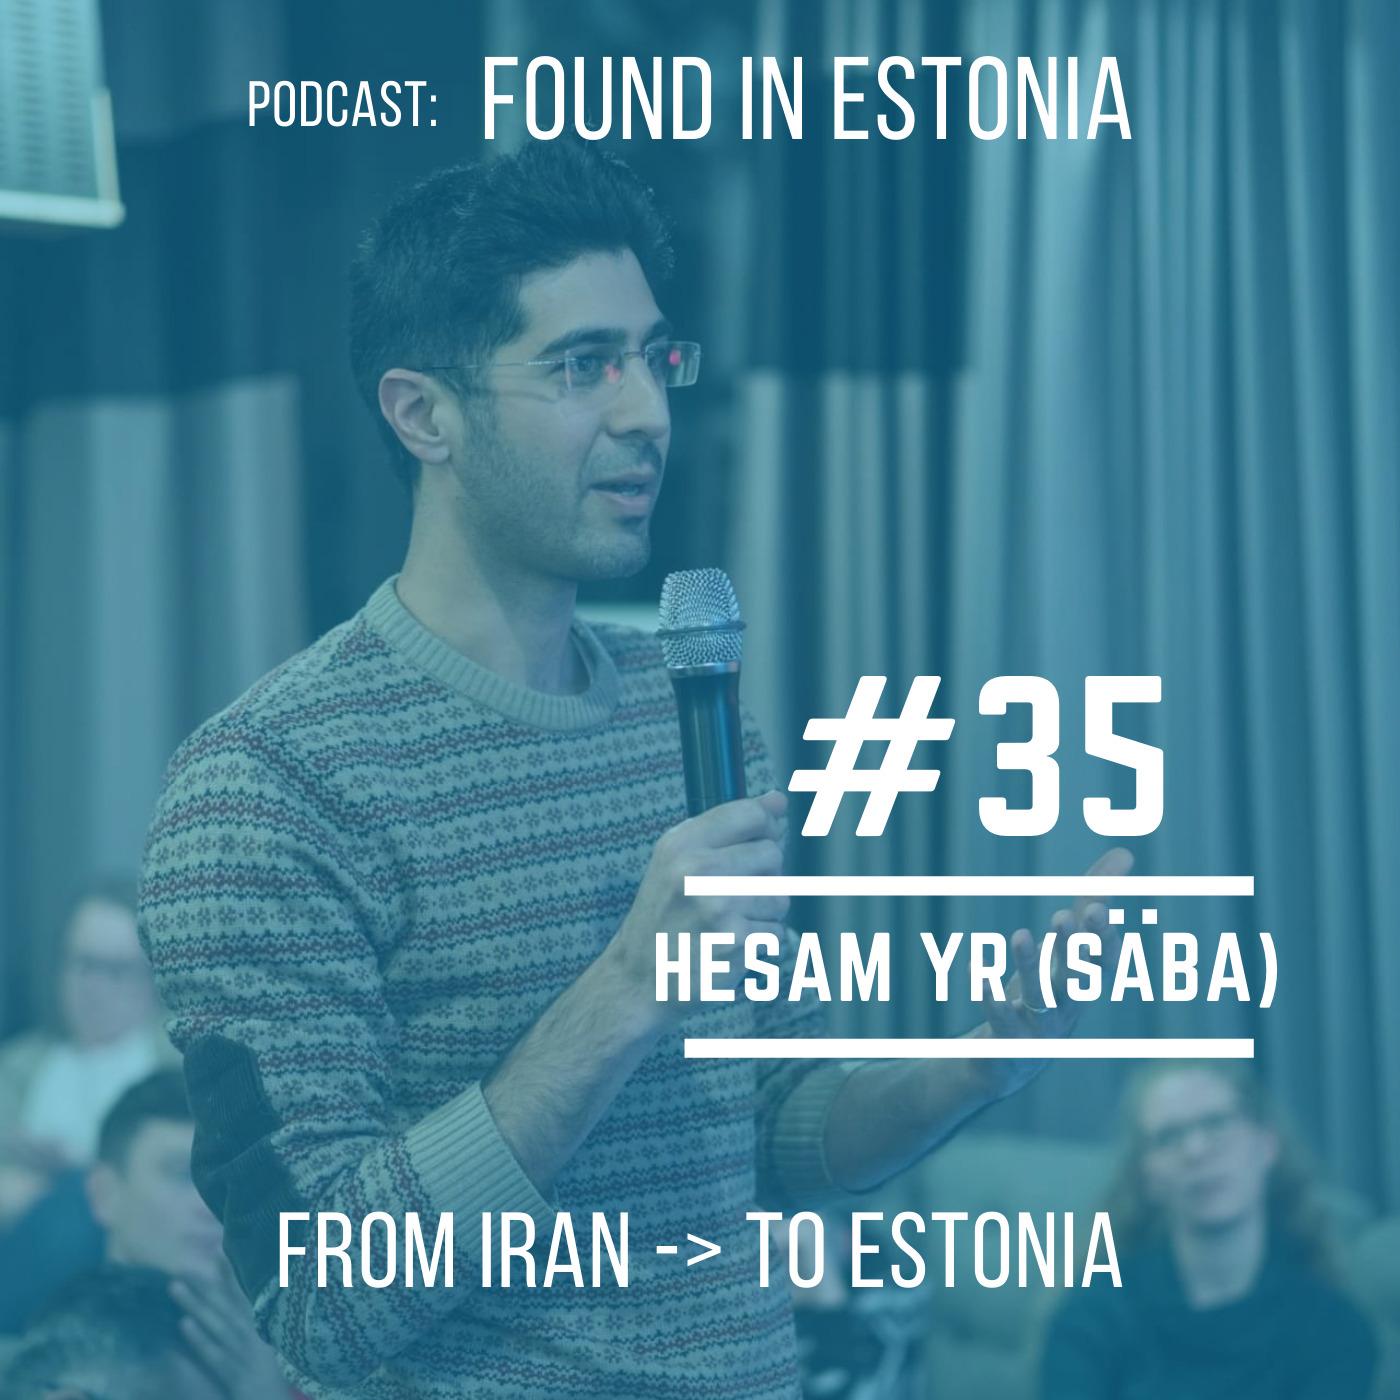 #35 Hesam YR (Säba): from Iran to Estonia